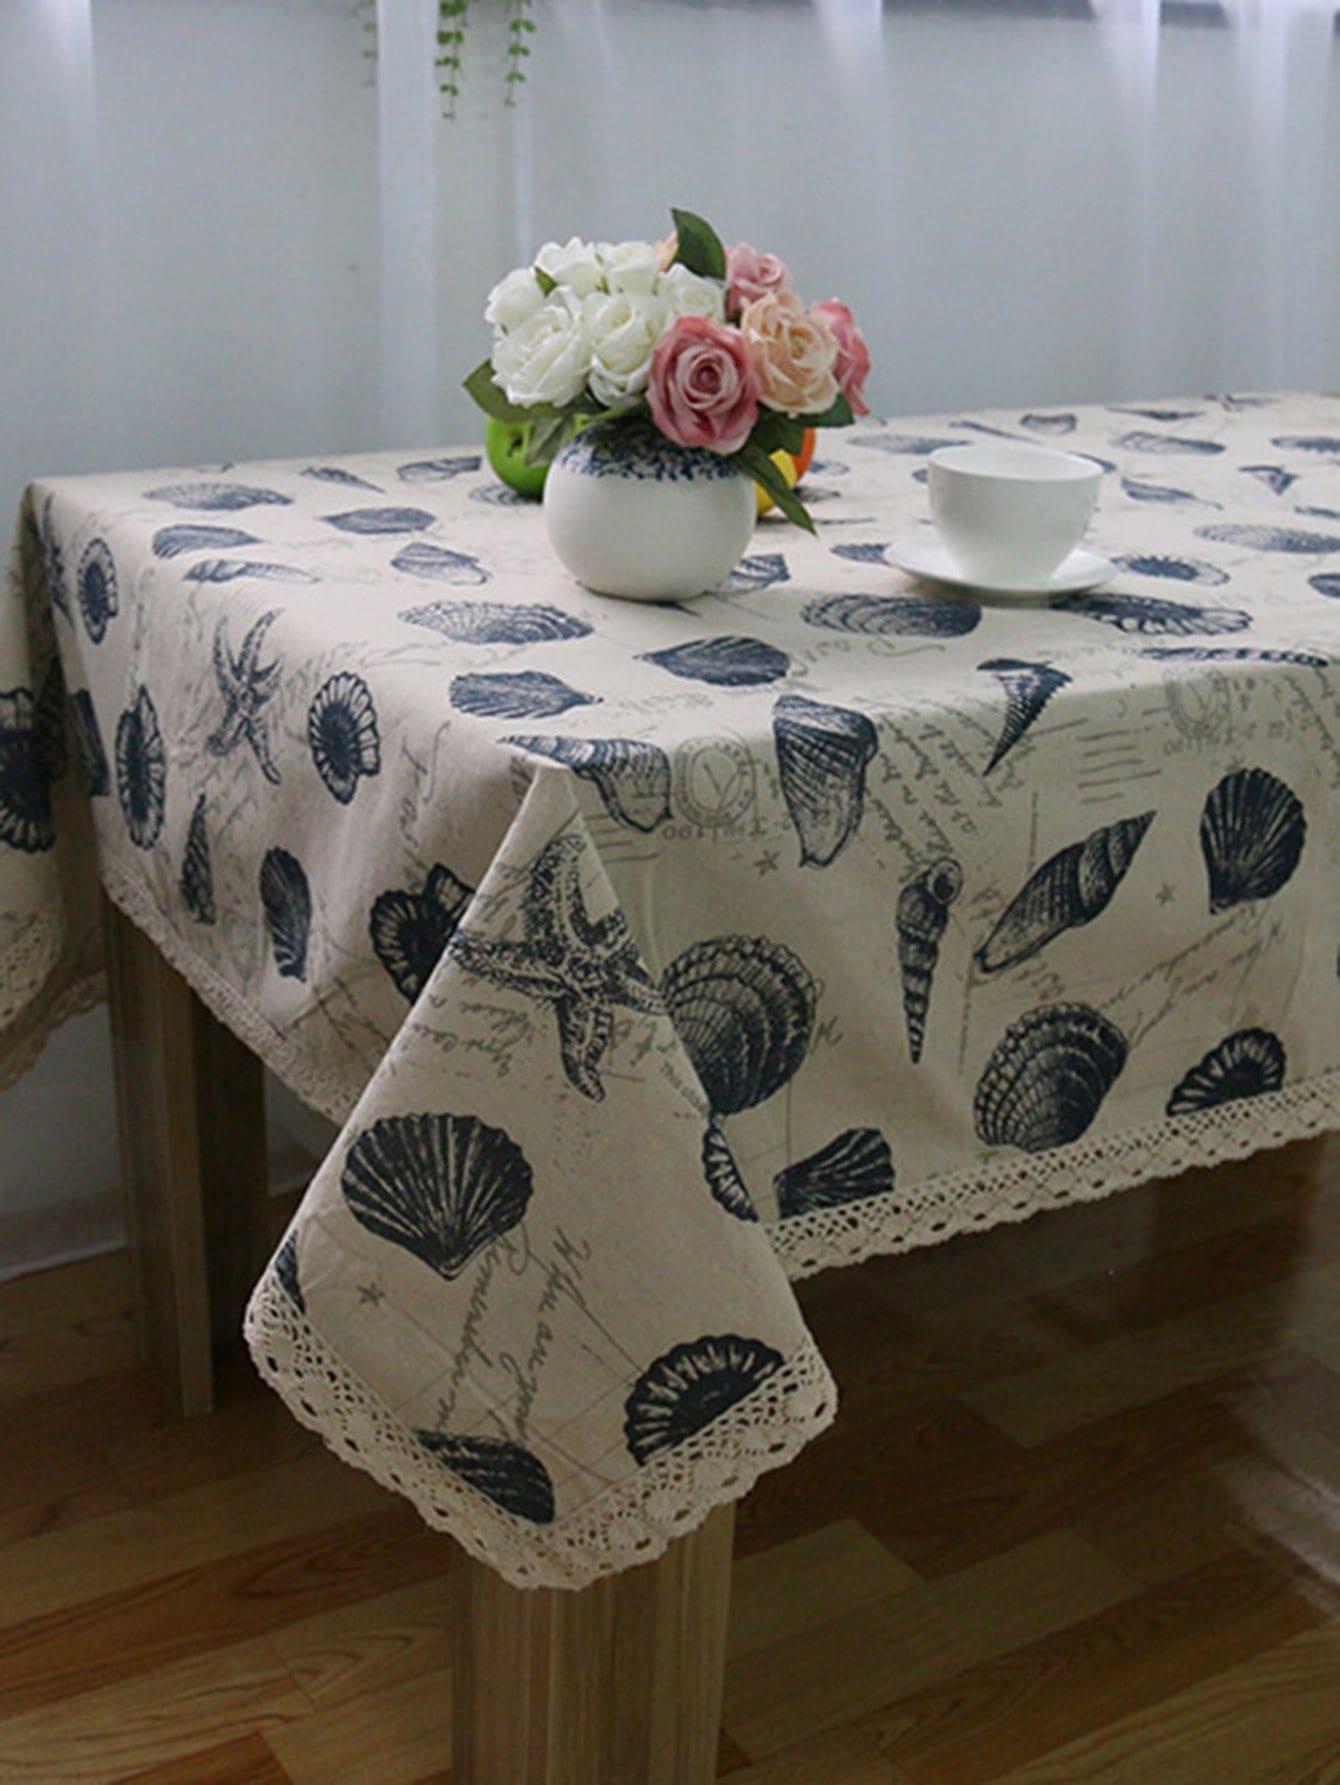 Shell Print Tablecloth 1pair iron shoe rack flip frame 3 layers option black color hidden hinge